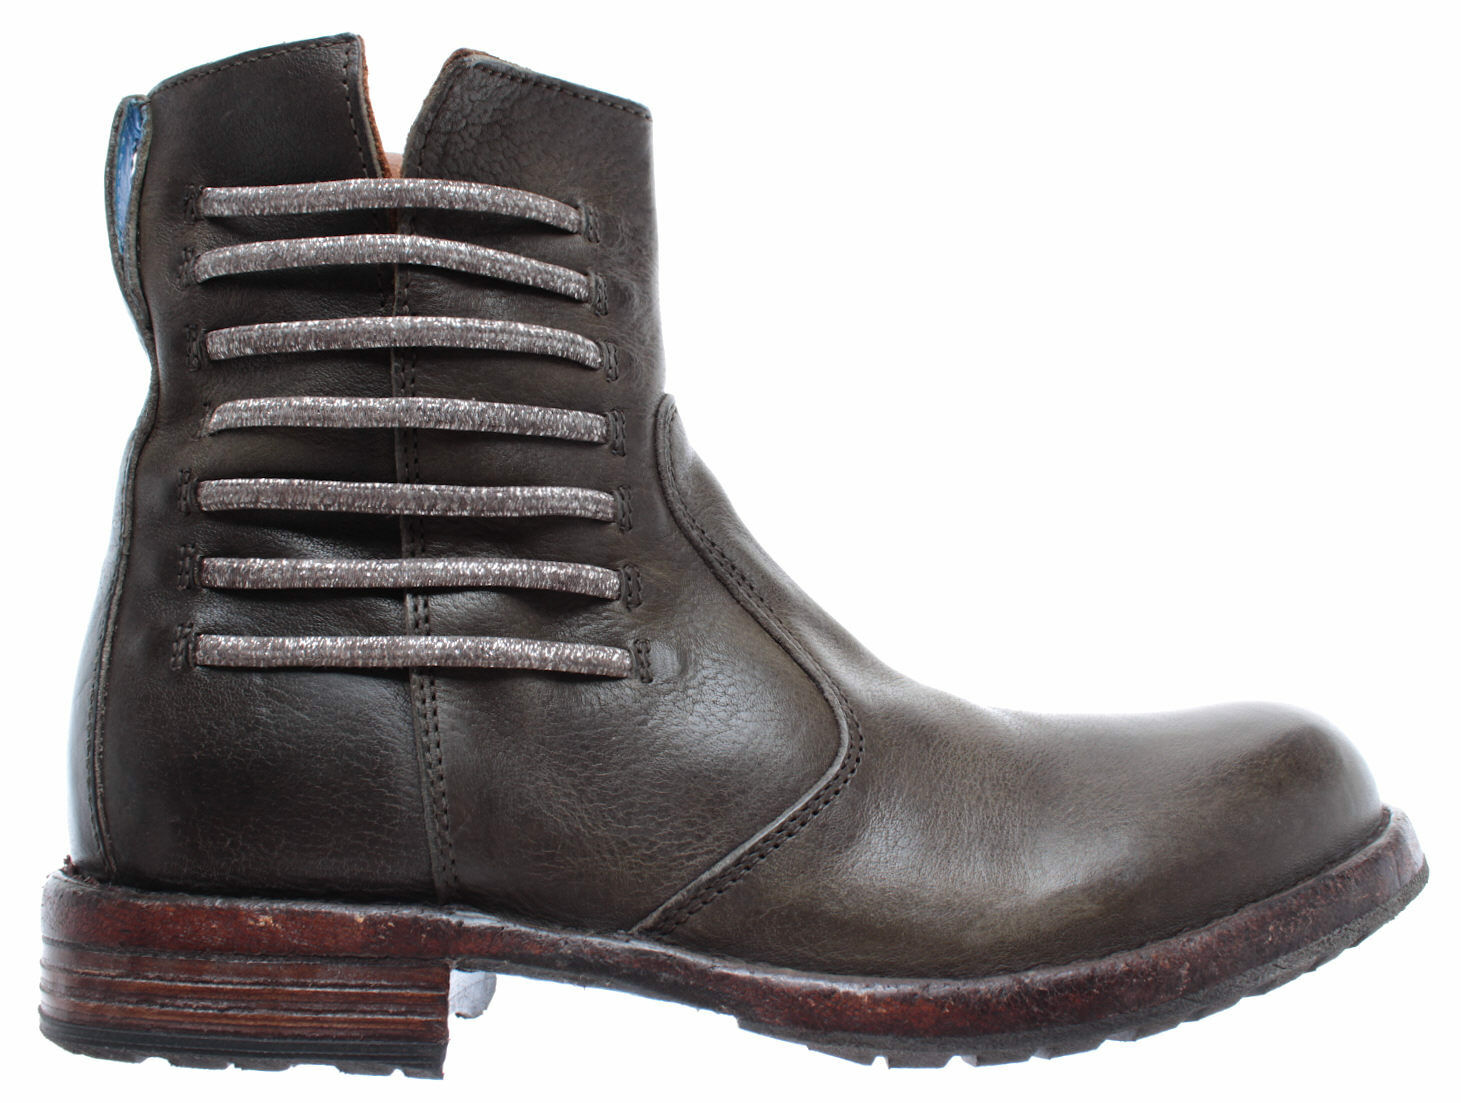 MOMA Damen Damen Damen Schuhe Stiefeletten 79813-2H Cusna Old Trafford Vintage Made In  d9d8d4